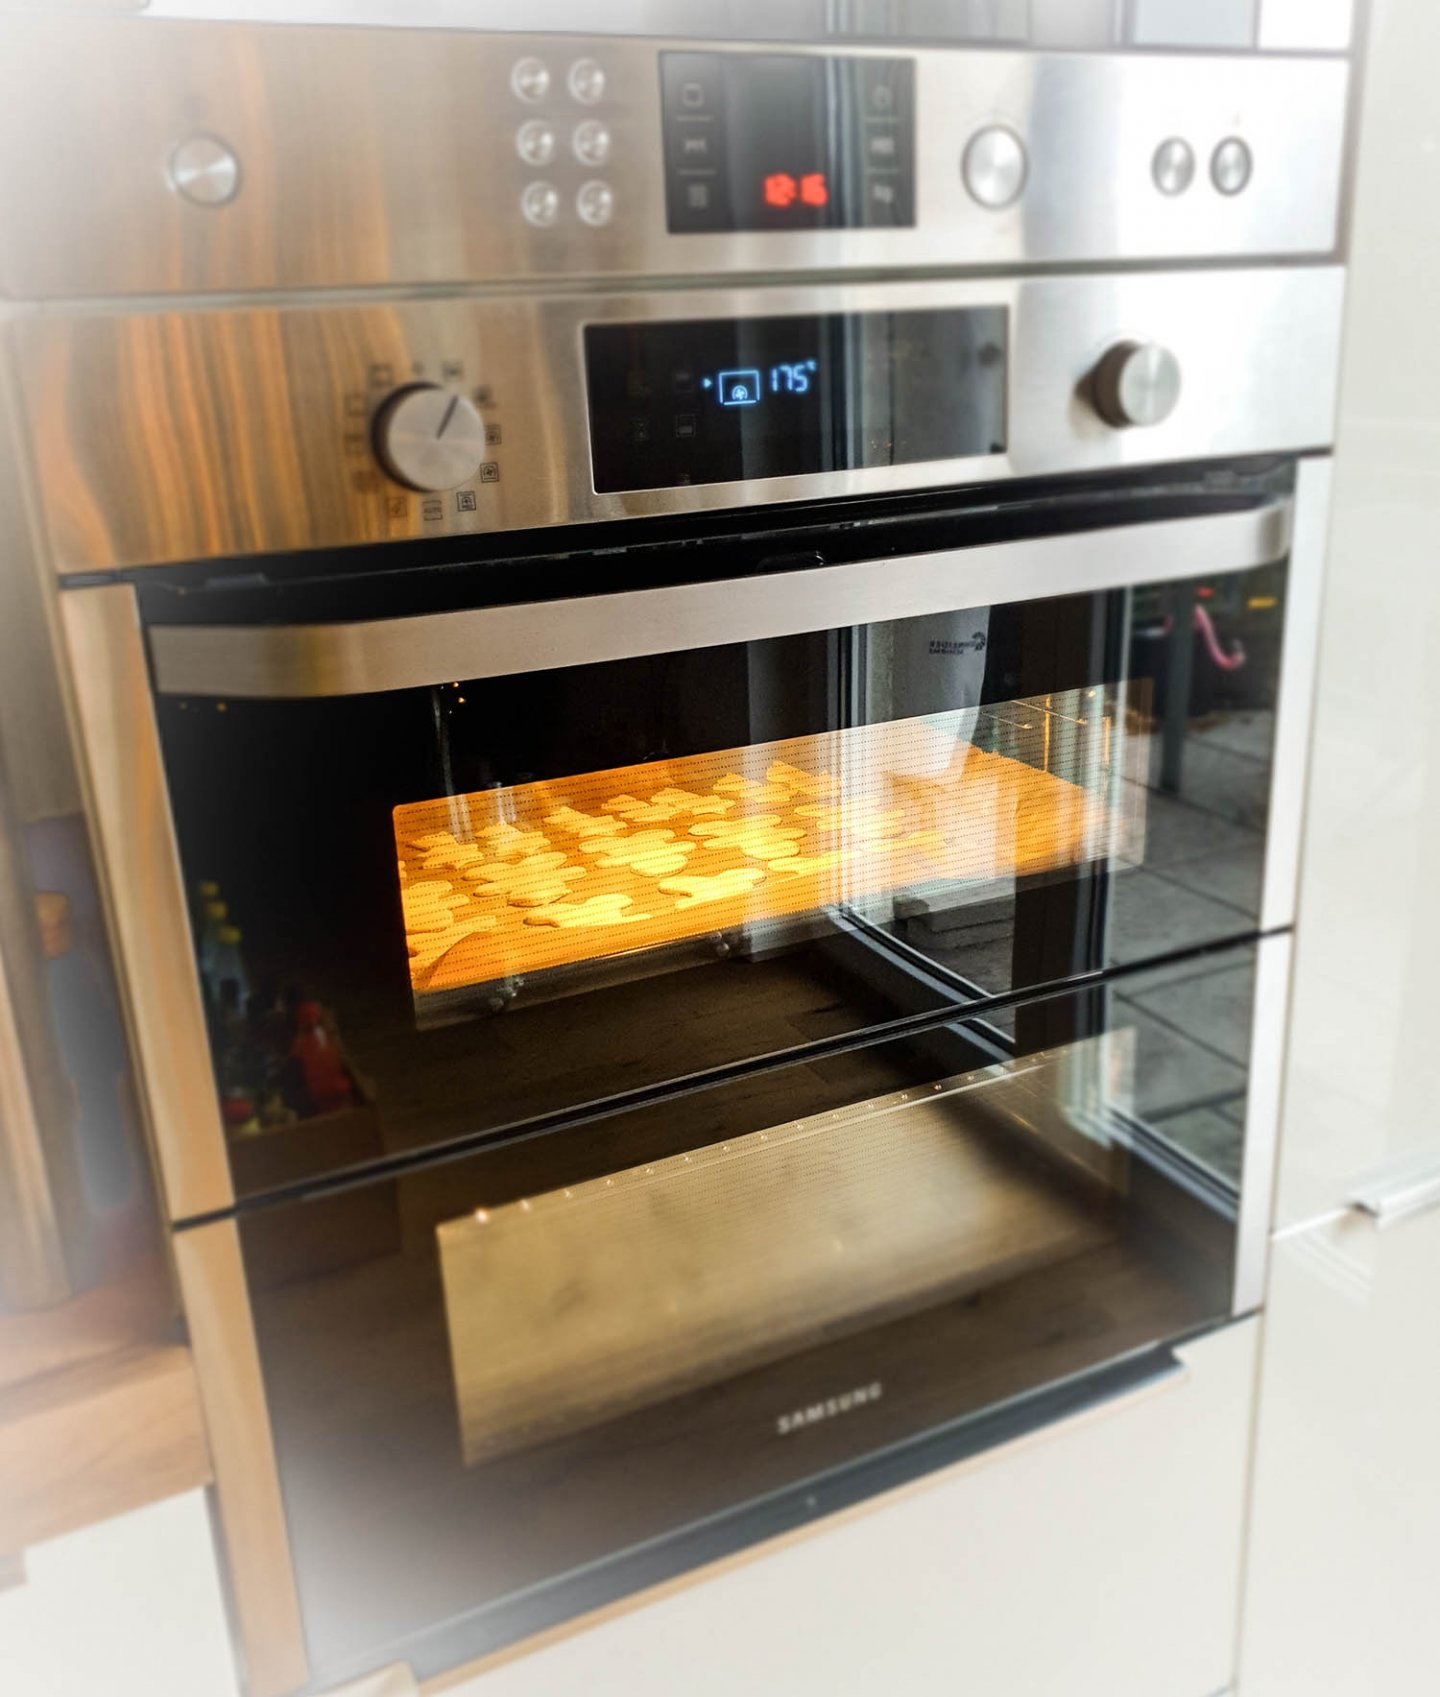 Samsung-Backofen-Dual-Cook-Flex-Produkttest-Kationette-Lifestyleblogger-Germany